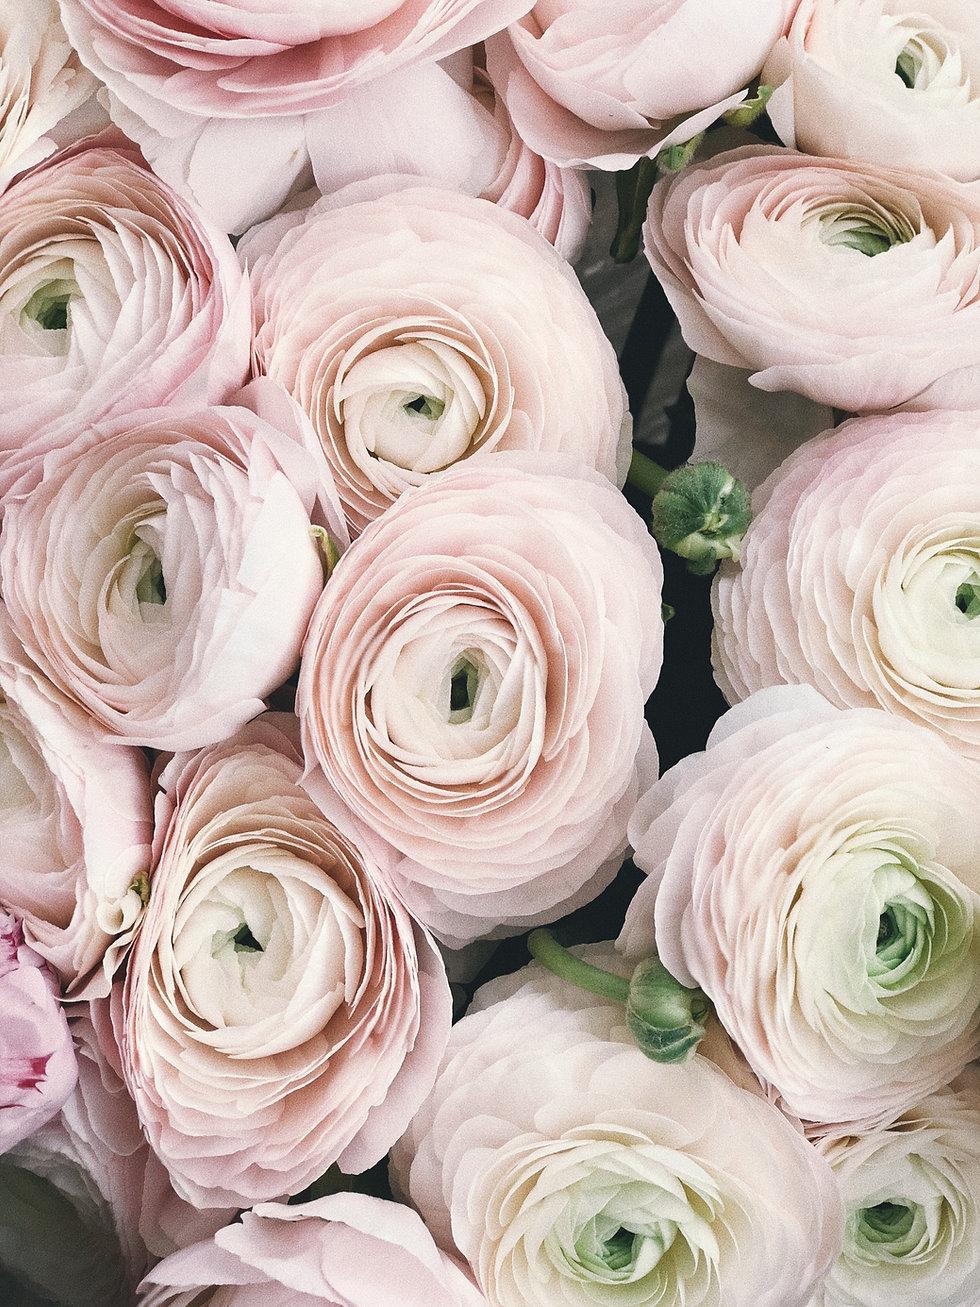 Canva - Close-up Photography of Pink Pet